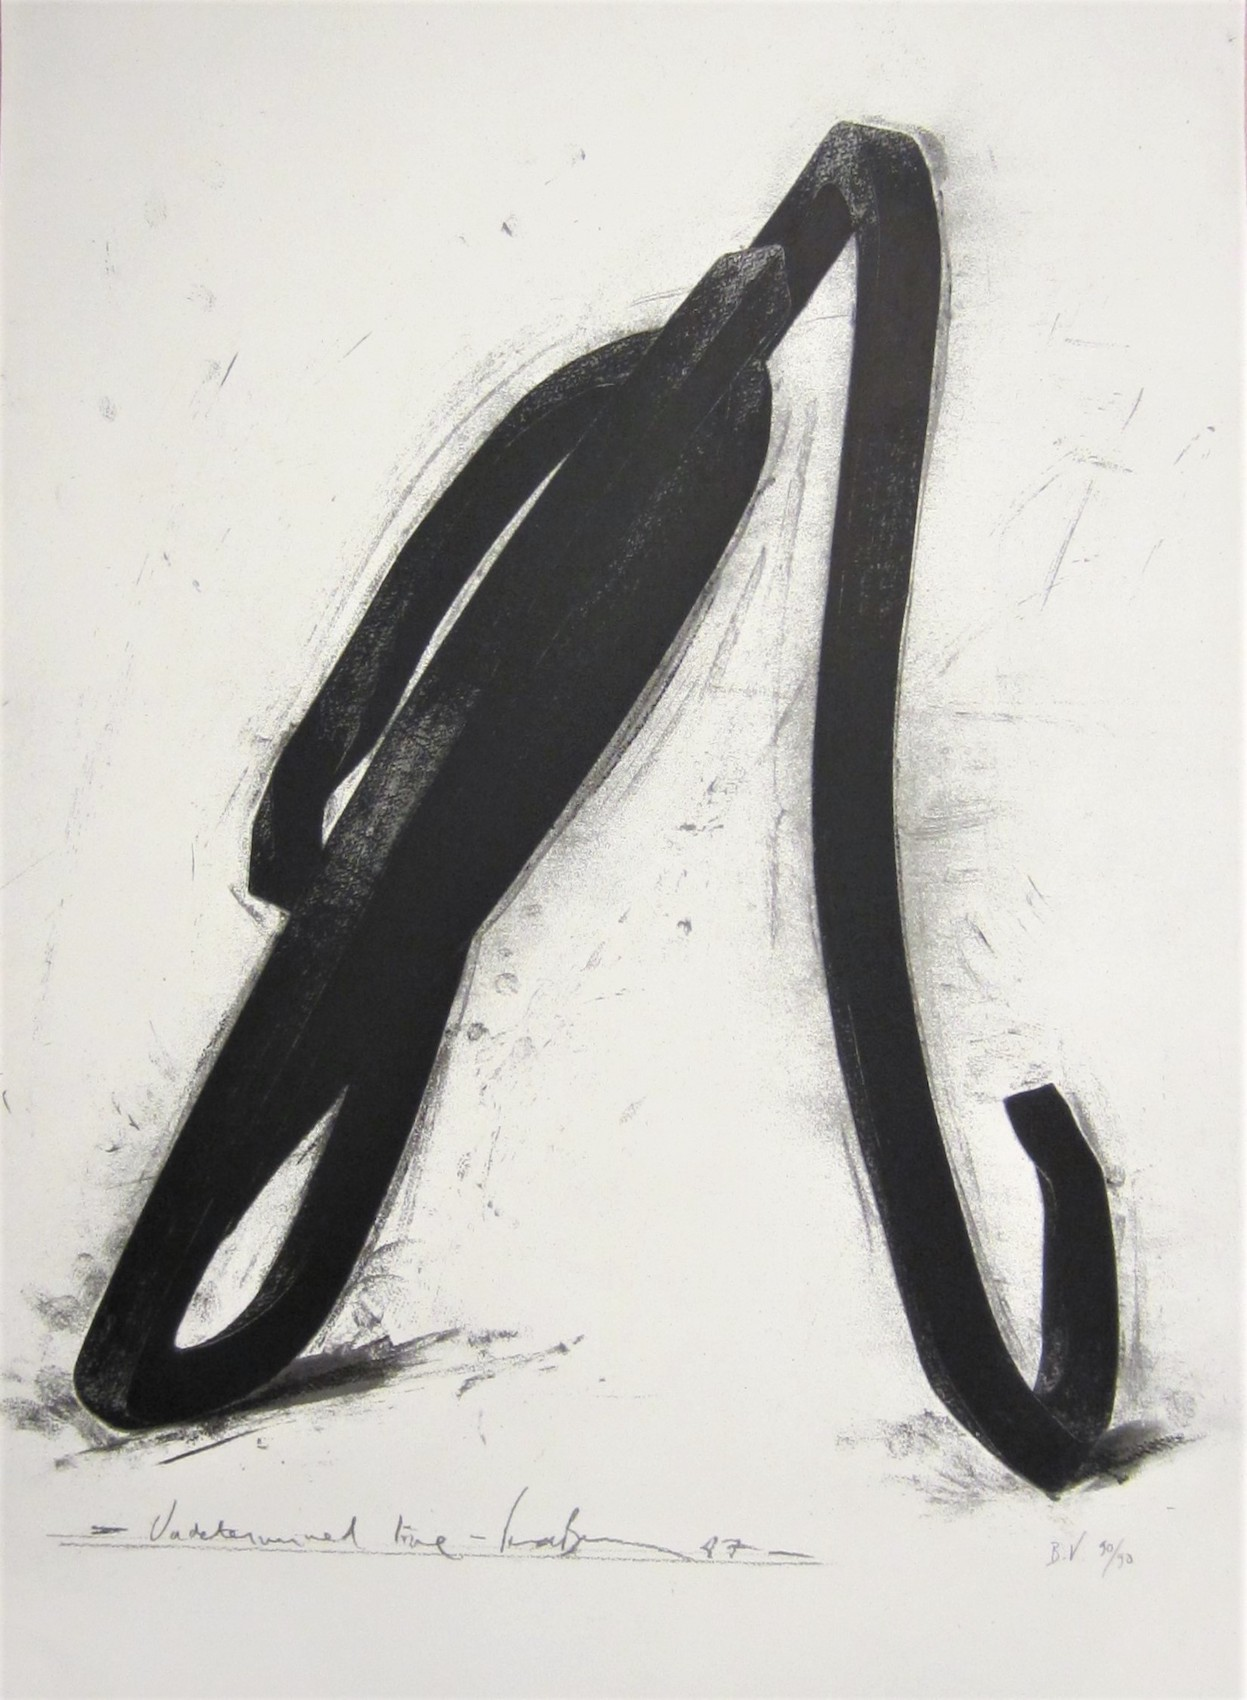 Undetermined Line by Bernar Venet